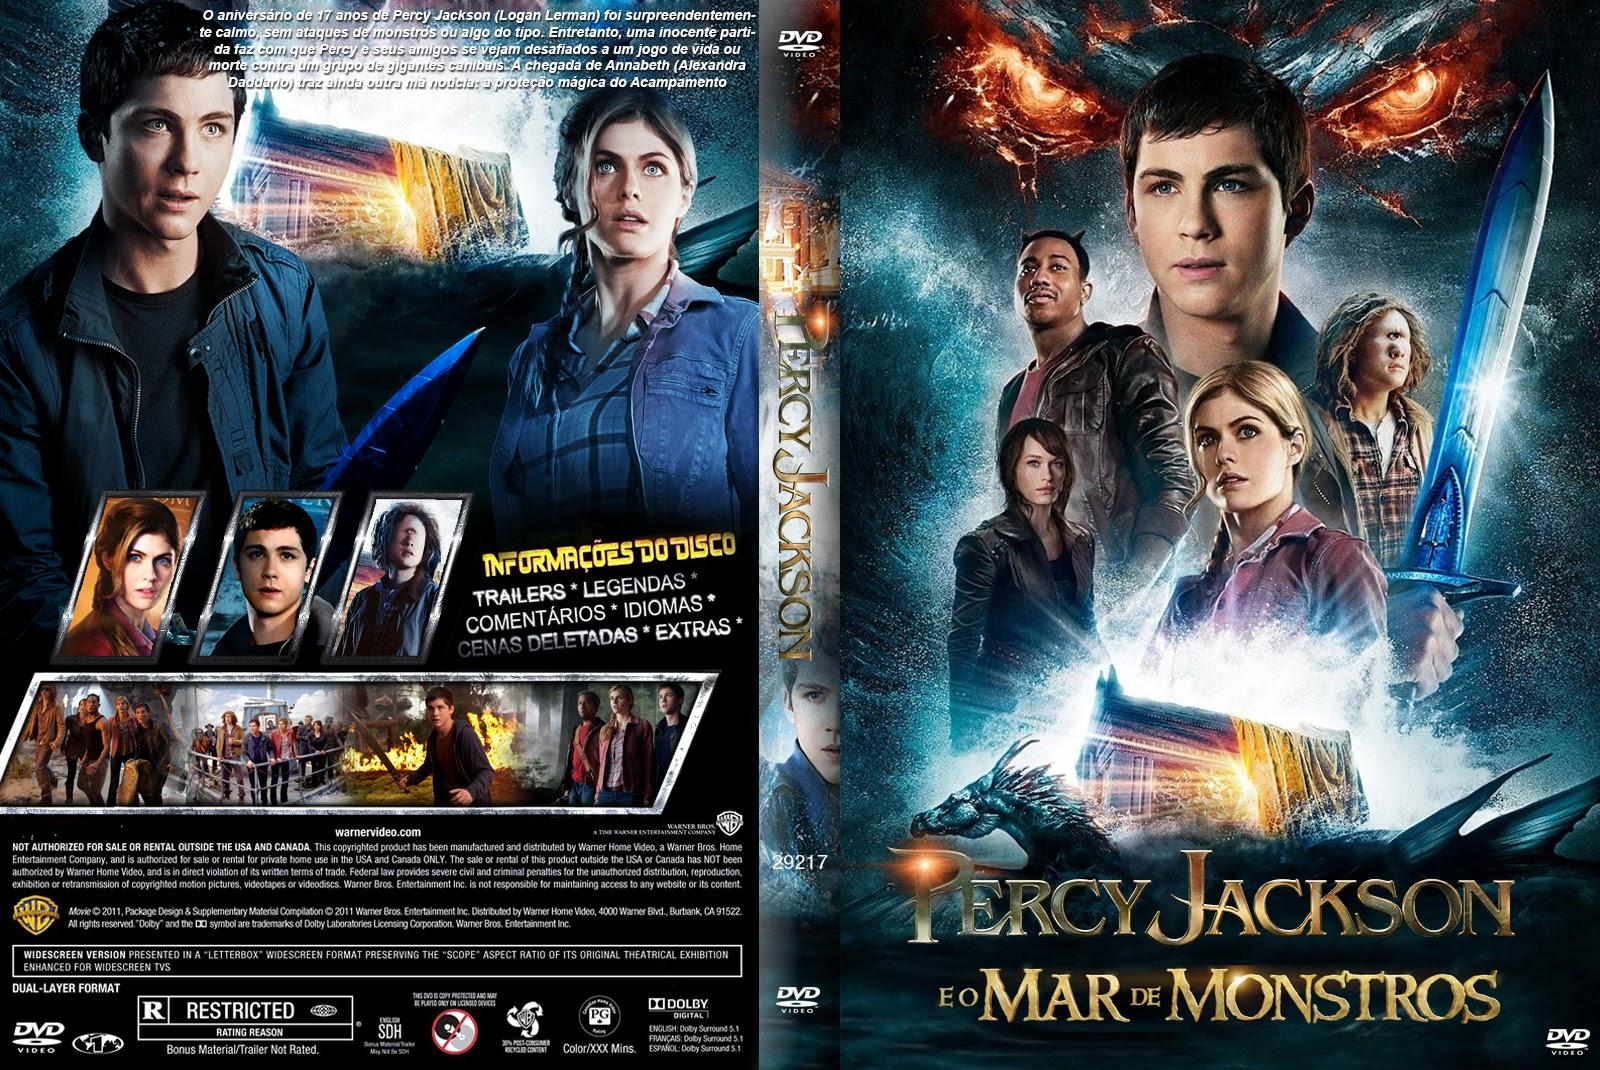 http://4.bp.blogspot.com/--C4WXbenlHs/UhFdCZESXpI/AAAAAAAAb-s/3NIShVQXOo4/s1600/Percy+Jackson+E+O+Mar+dos+Monstros.jpg